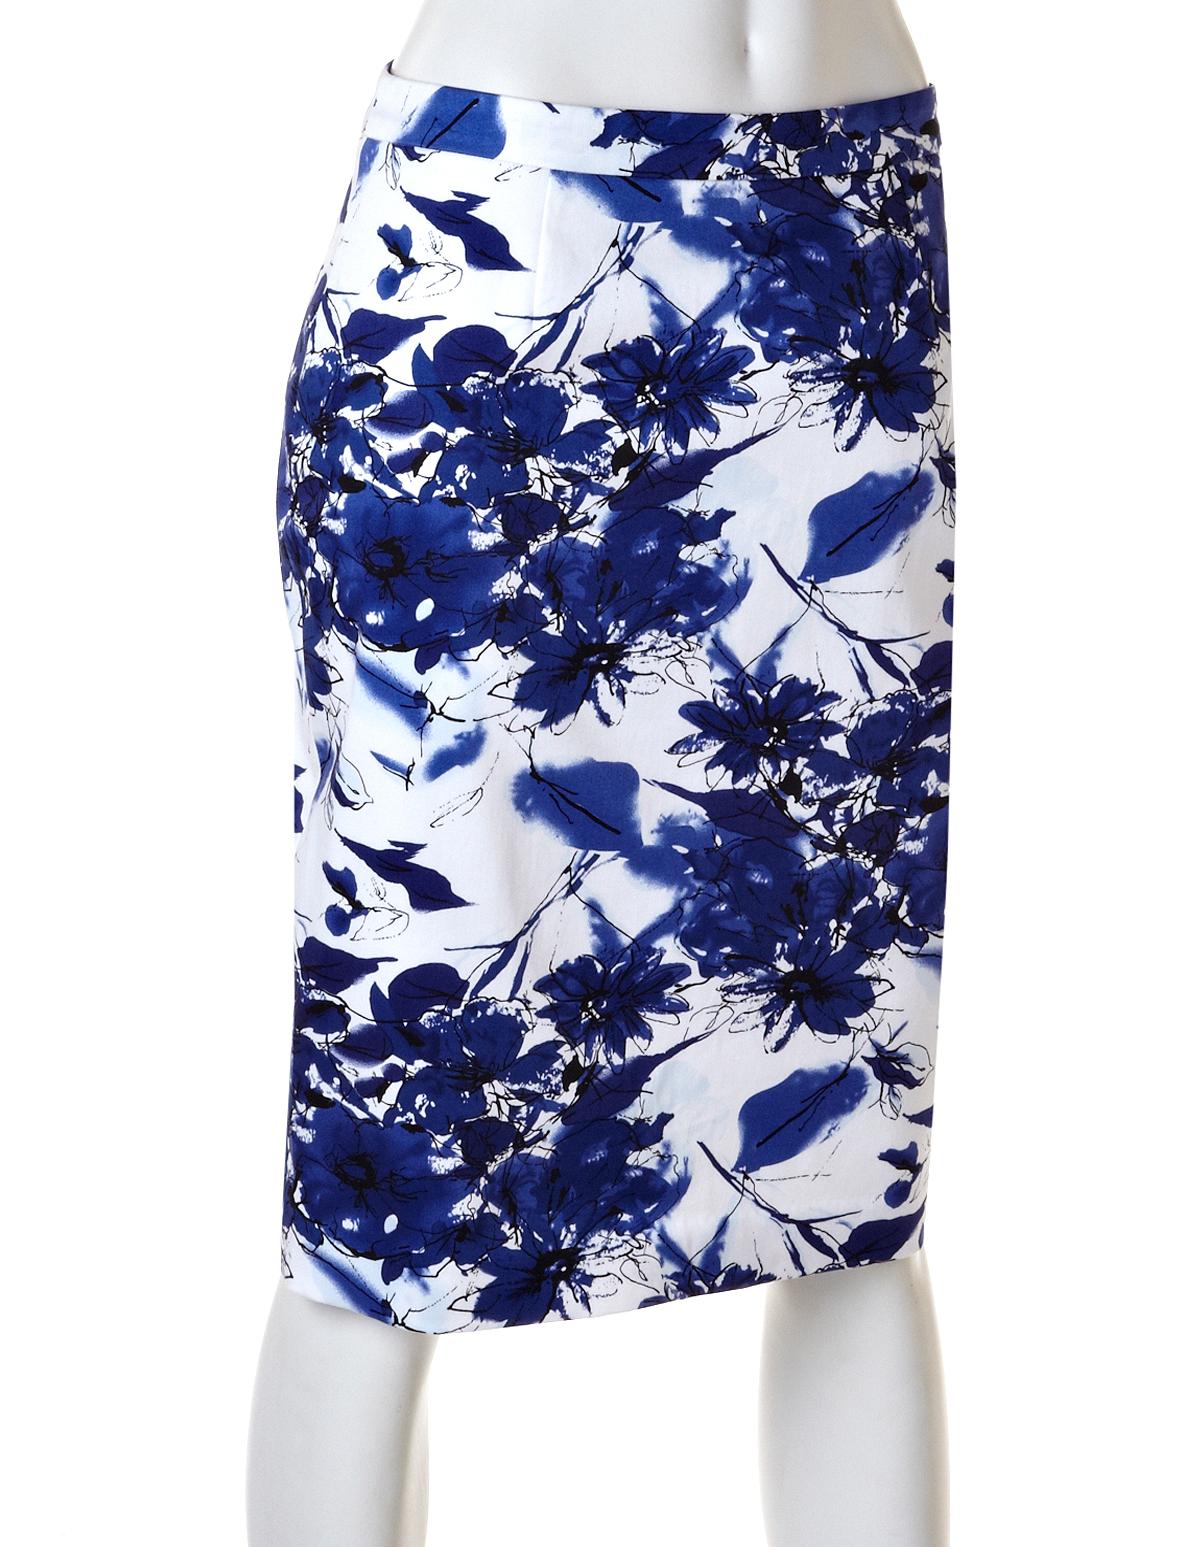 blue floral pencil skirt dress ala